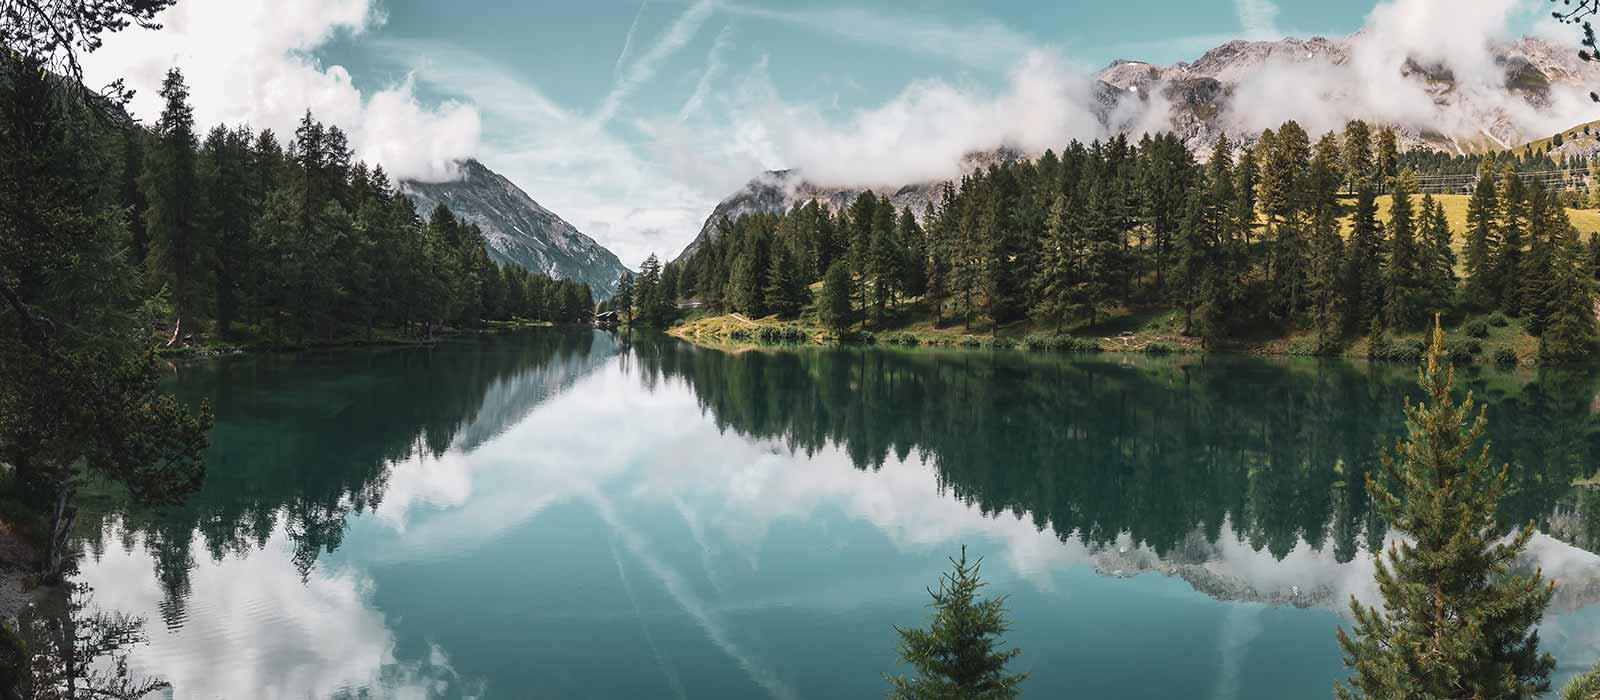 Mountains behind a lake with fresh air